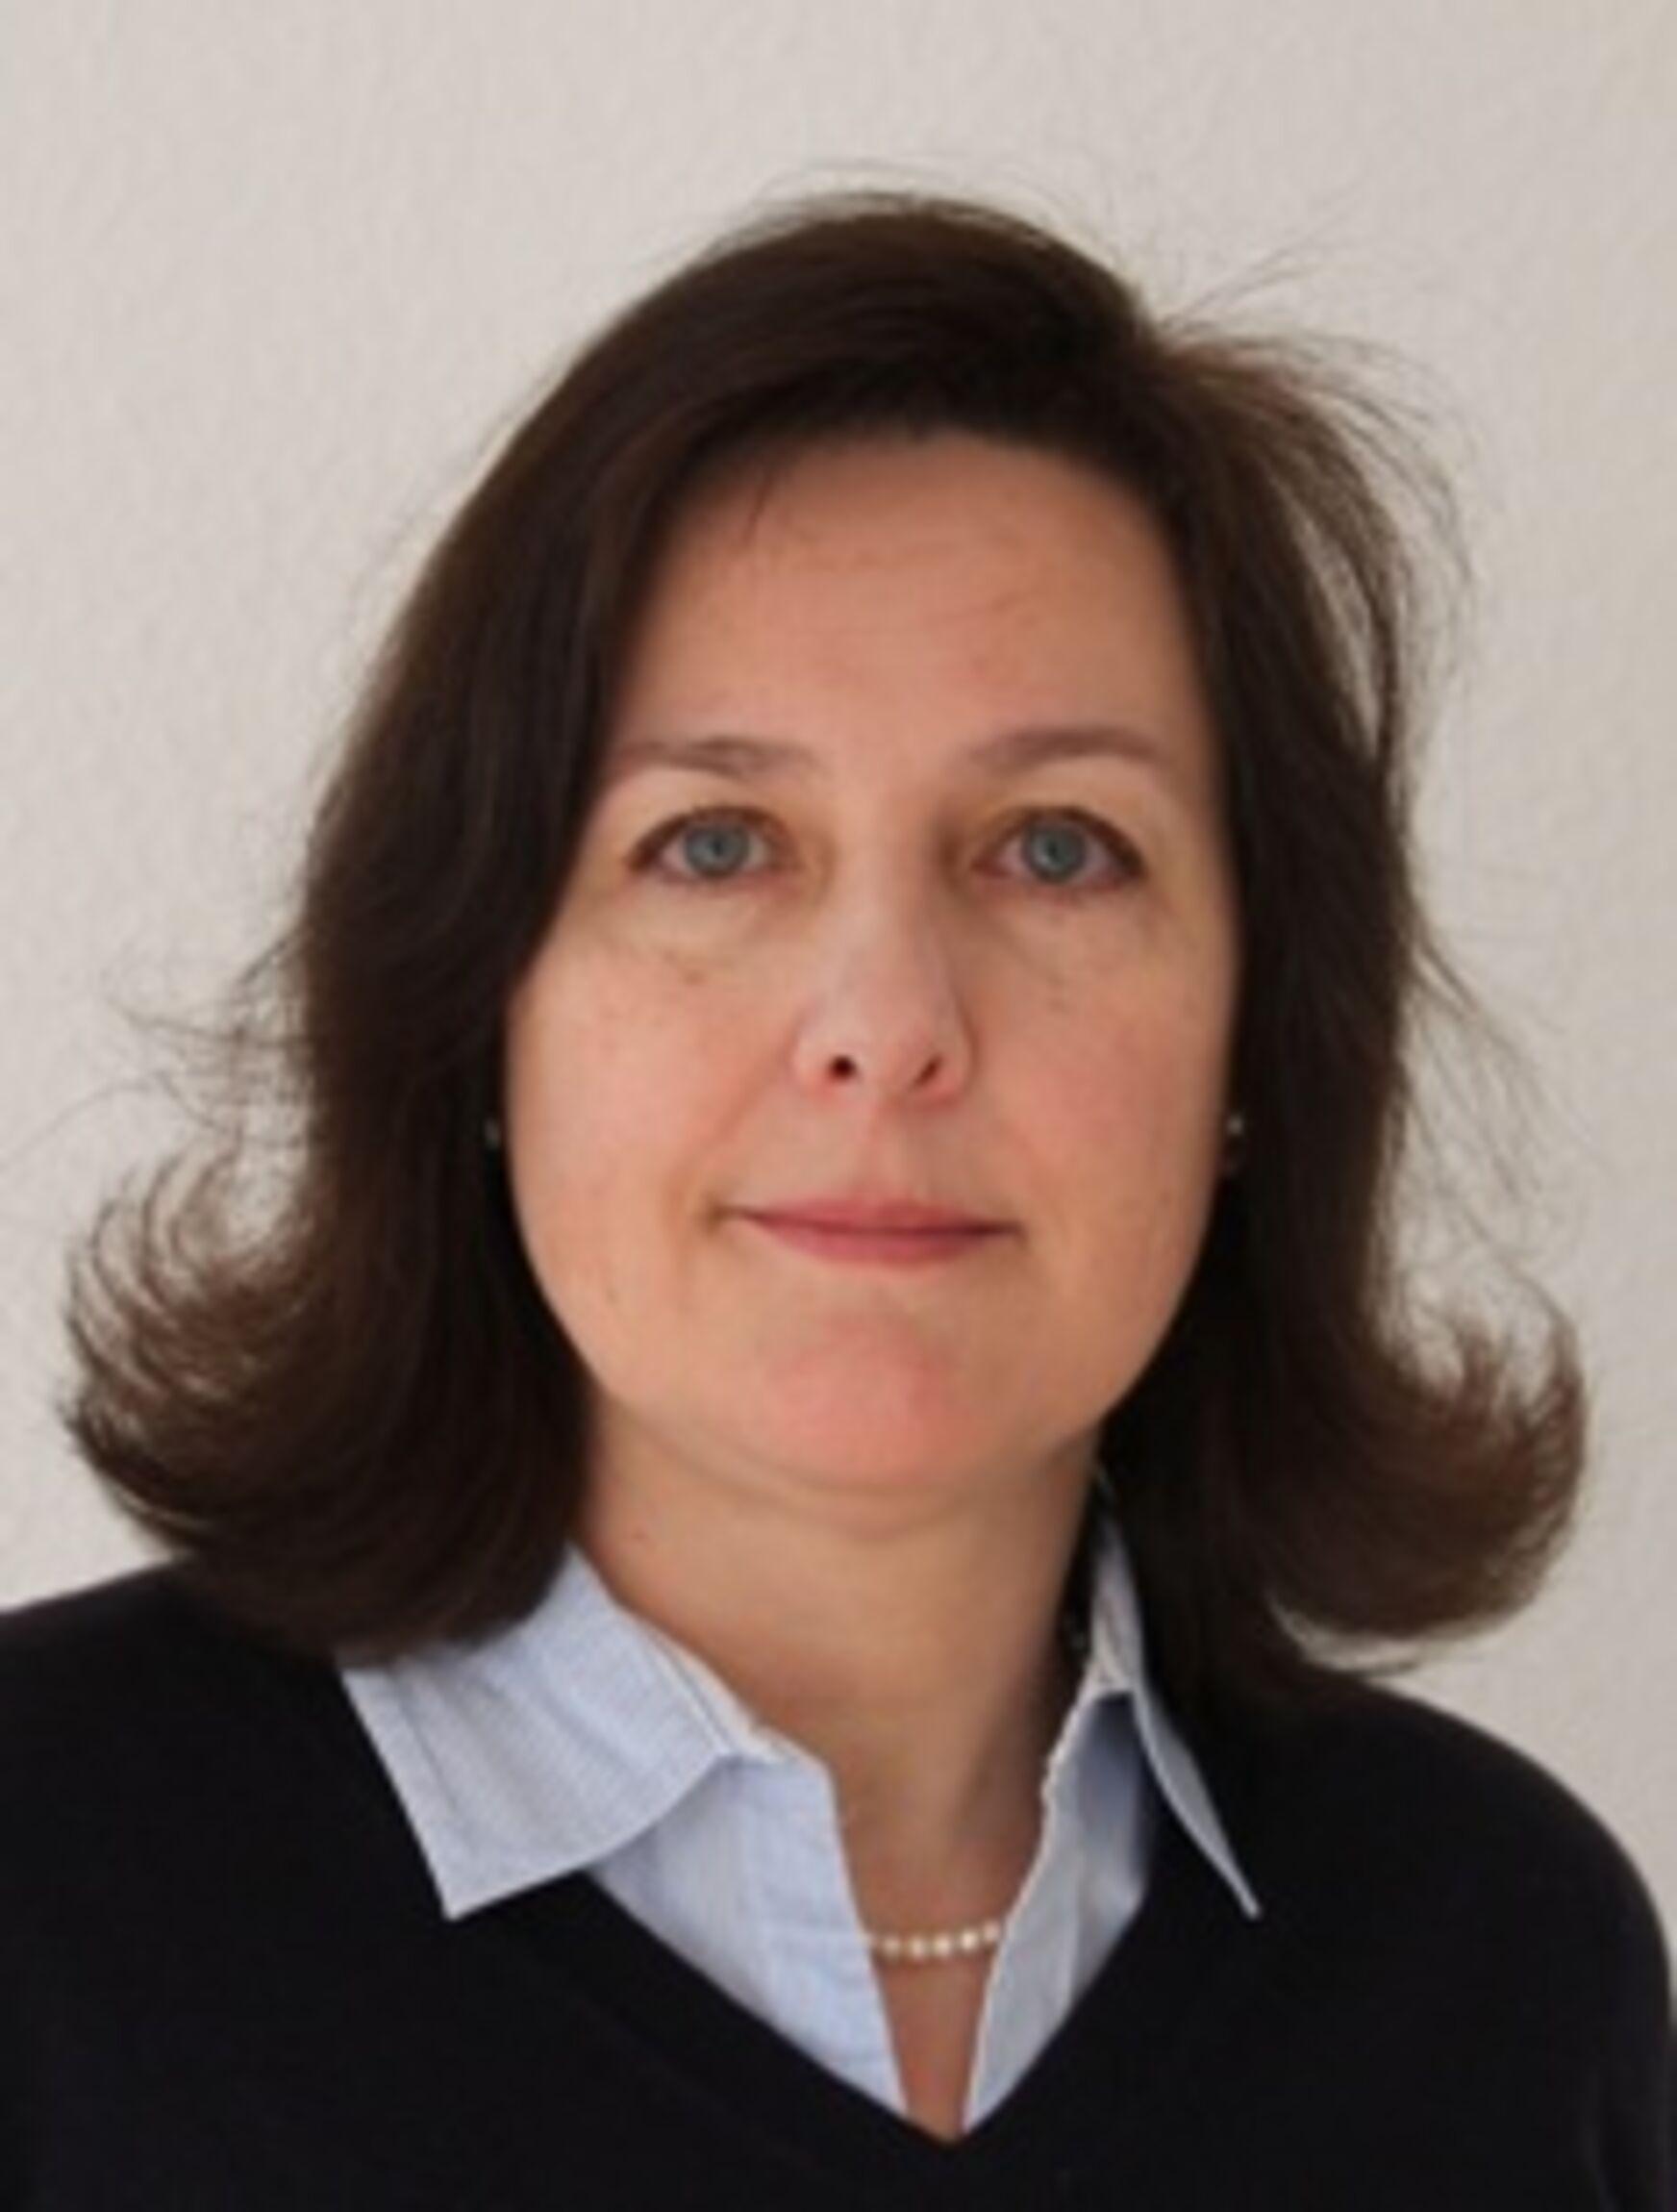 Christina Steffani Böringer